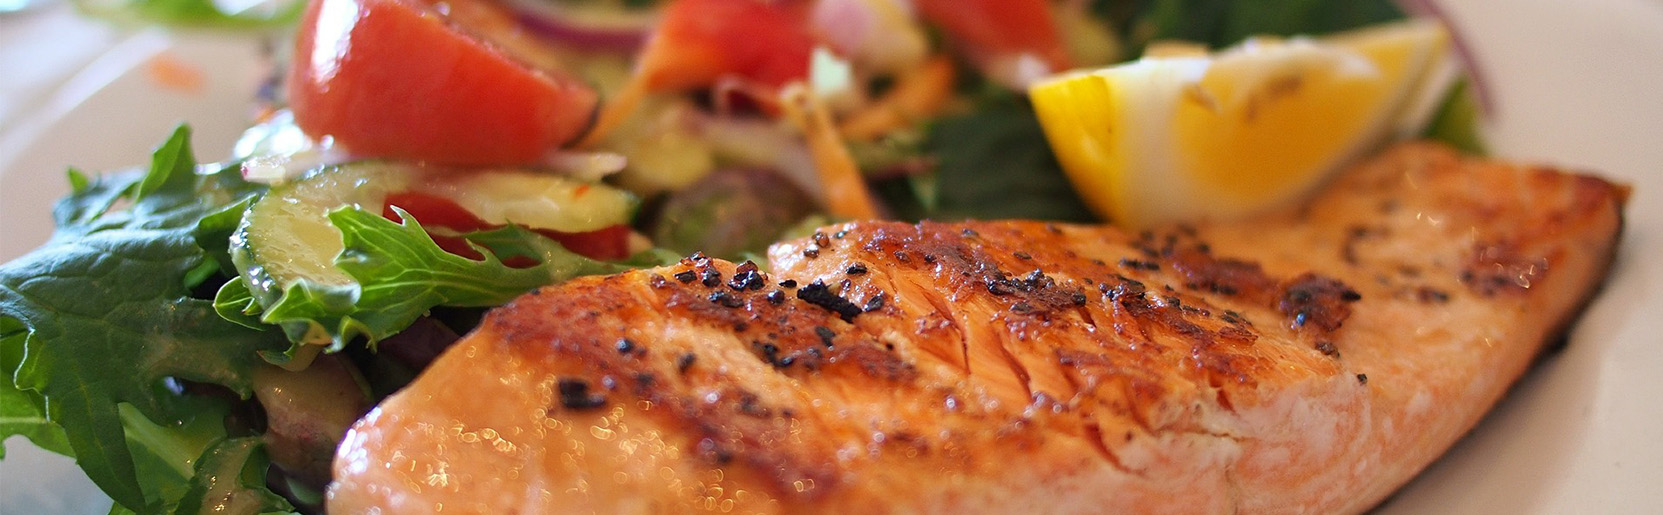 Dieta efectiva